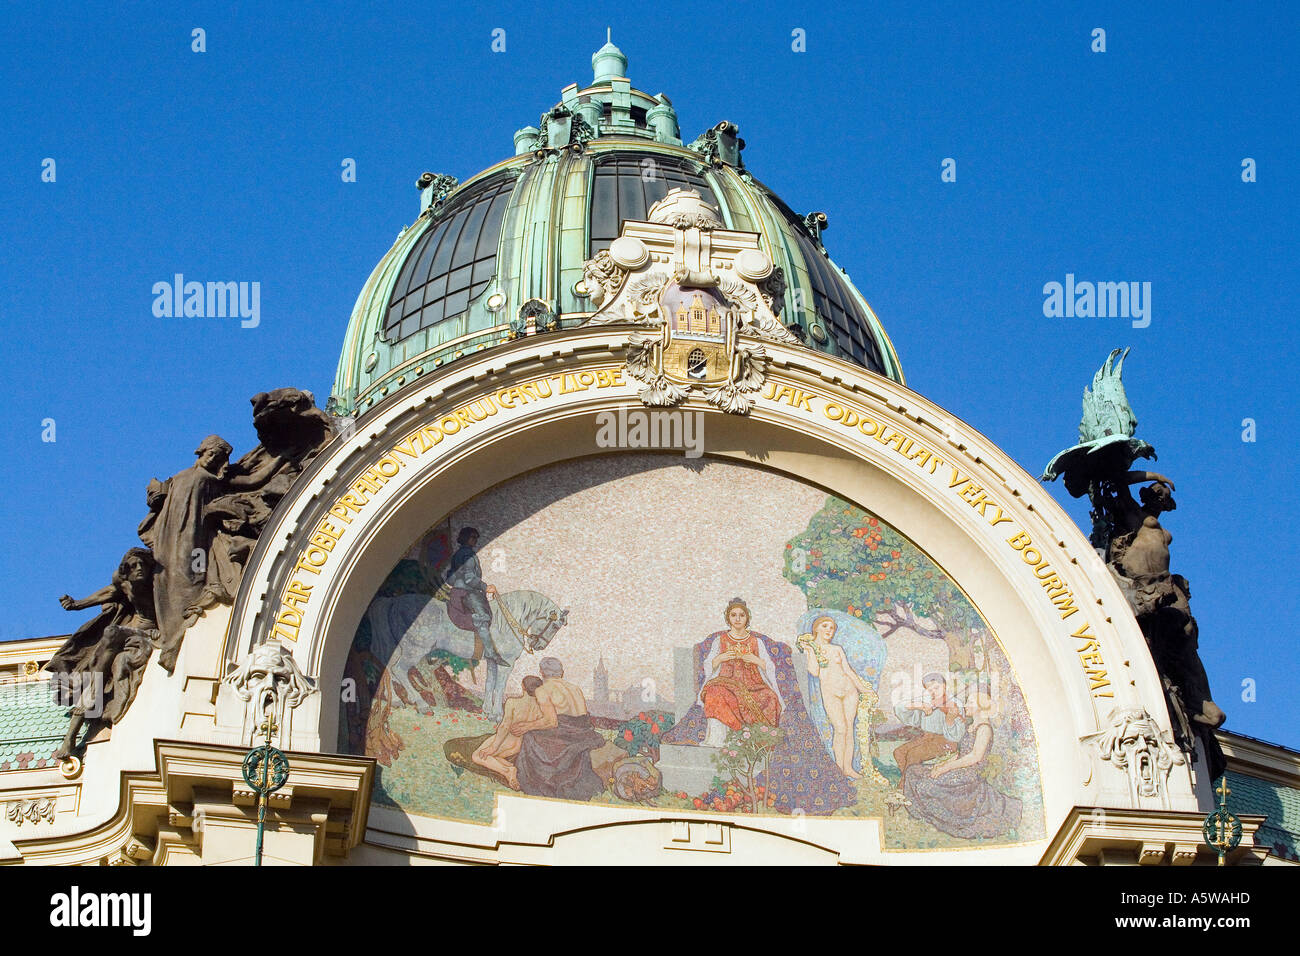 Design mosaic Prague Apotheosis. Exquisite Art Nouveau facade of the Municipal House Hall, Obecni Dum. Prague Stock Photo